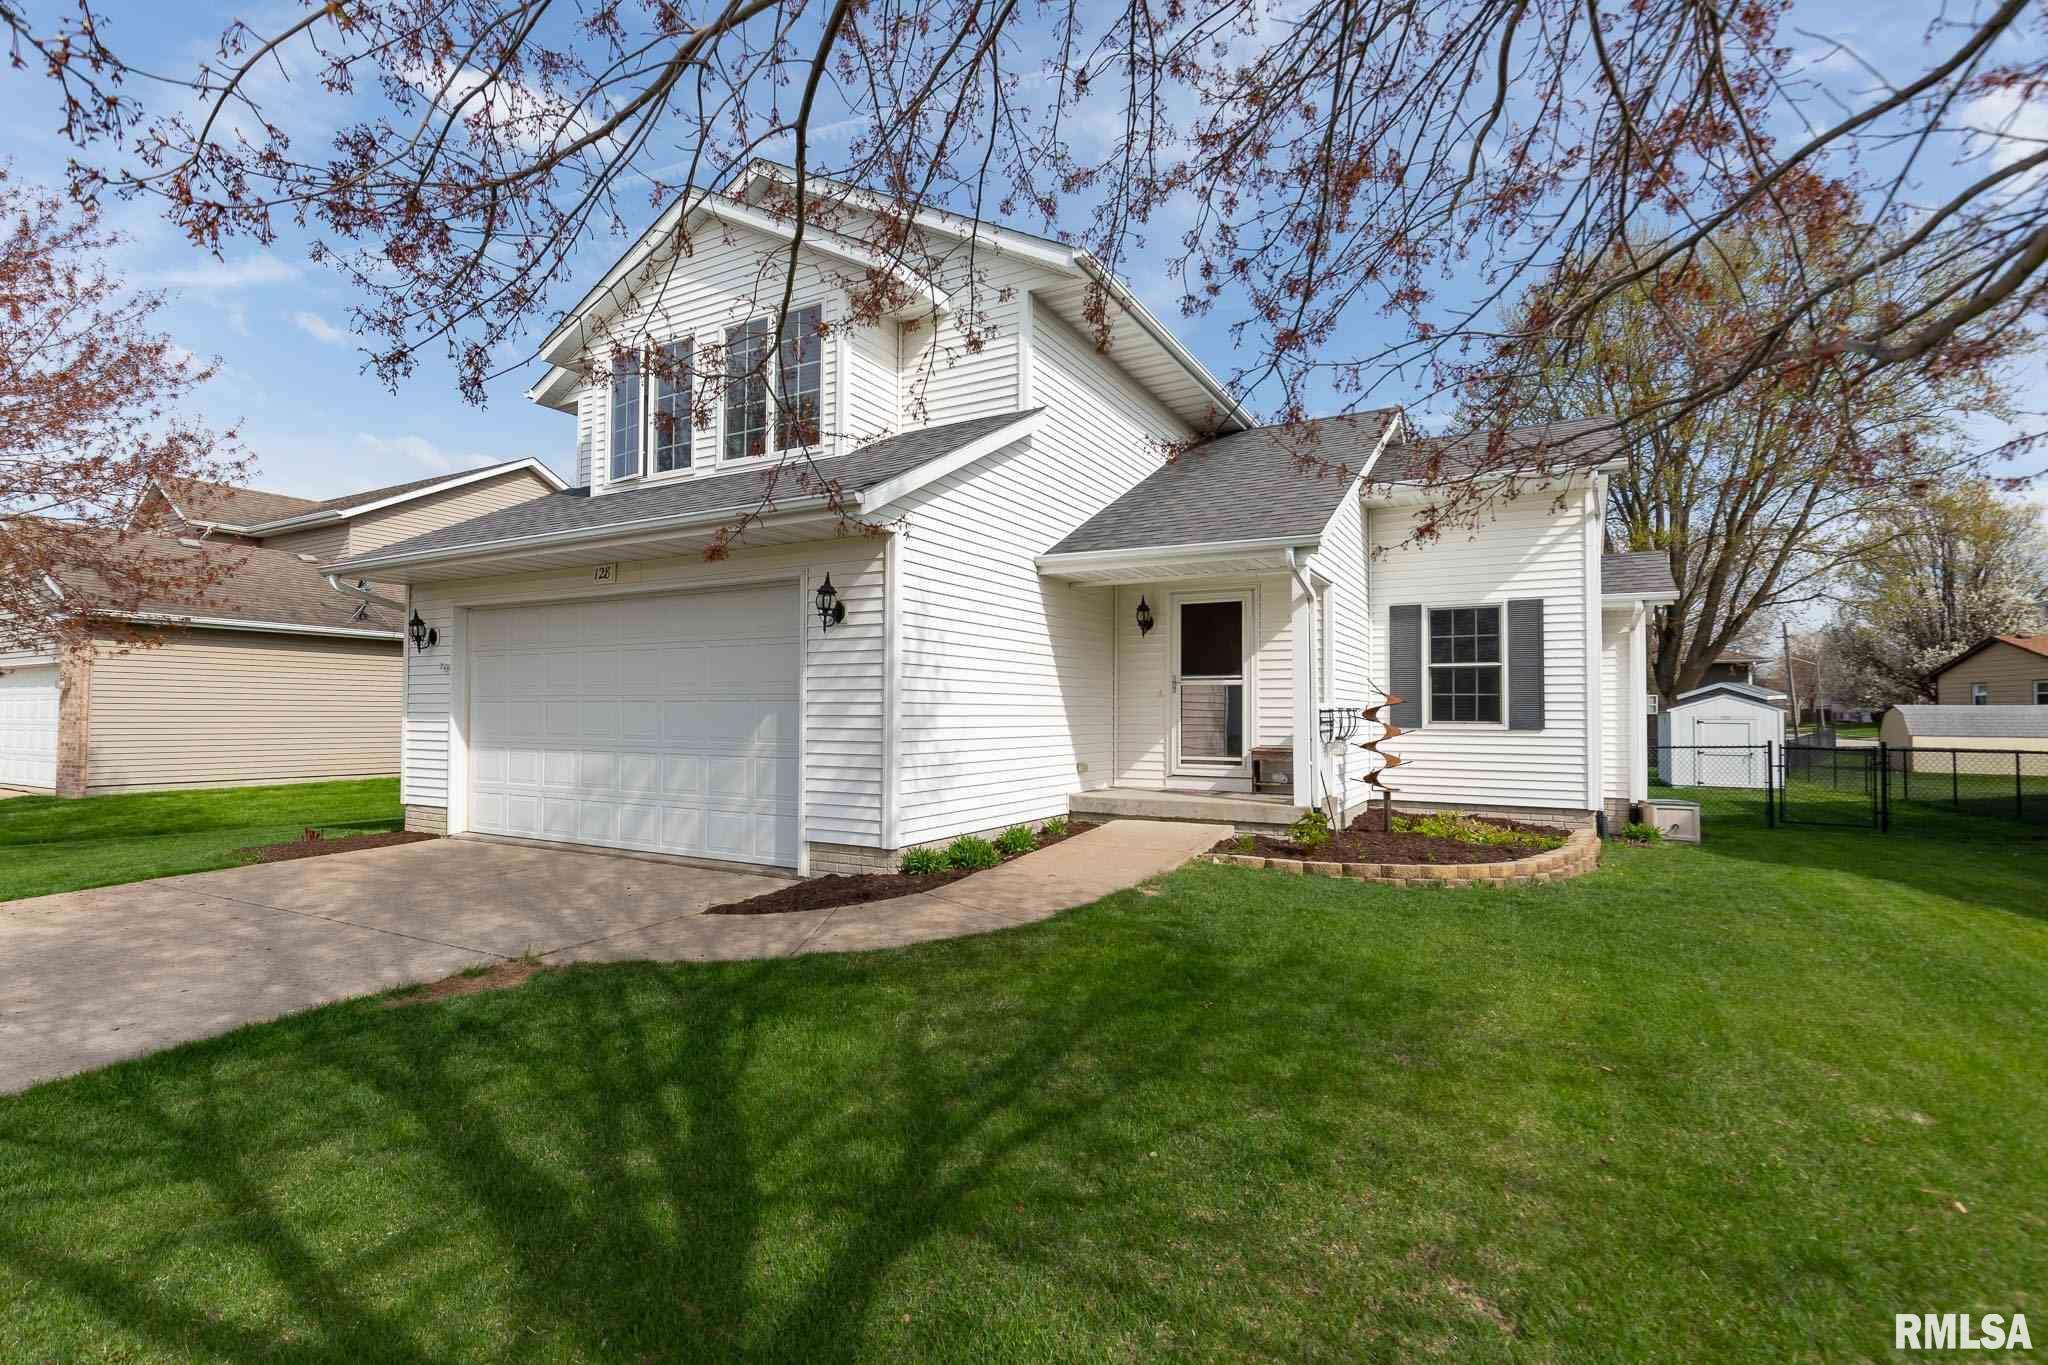 128 W PINEHURST Property Photo - Eldridge, IA real estate listing